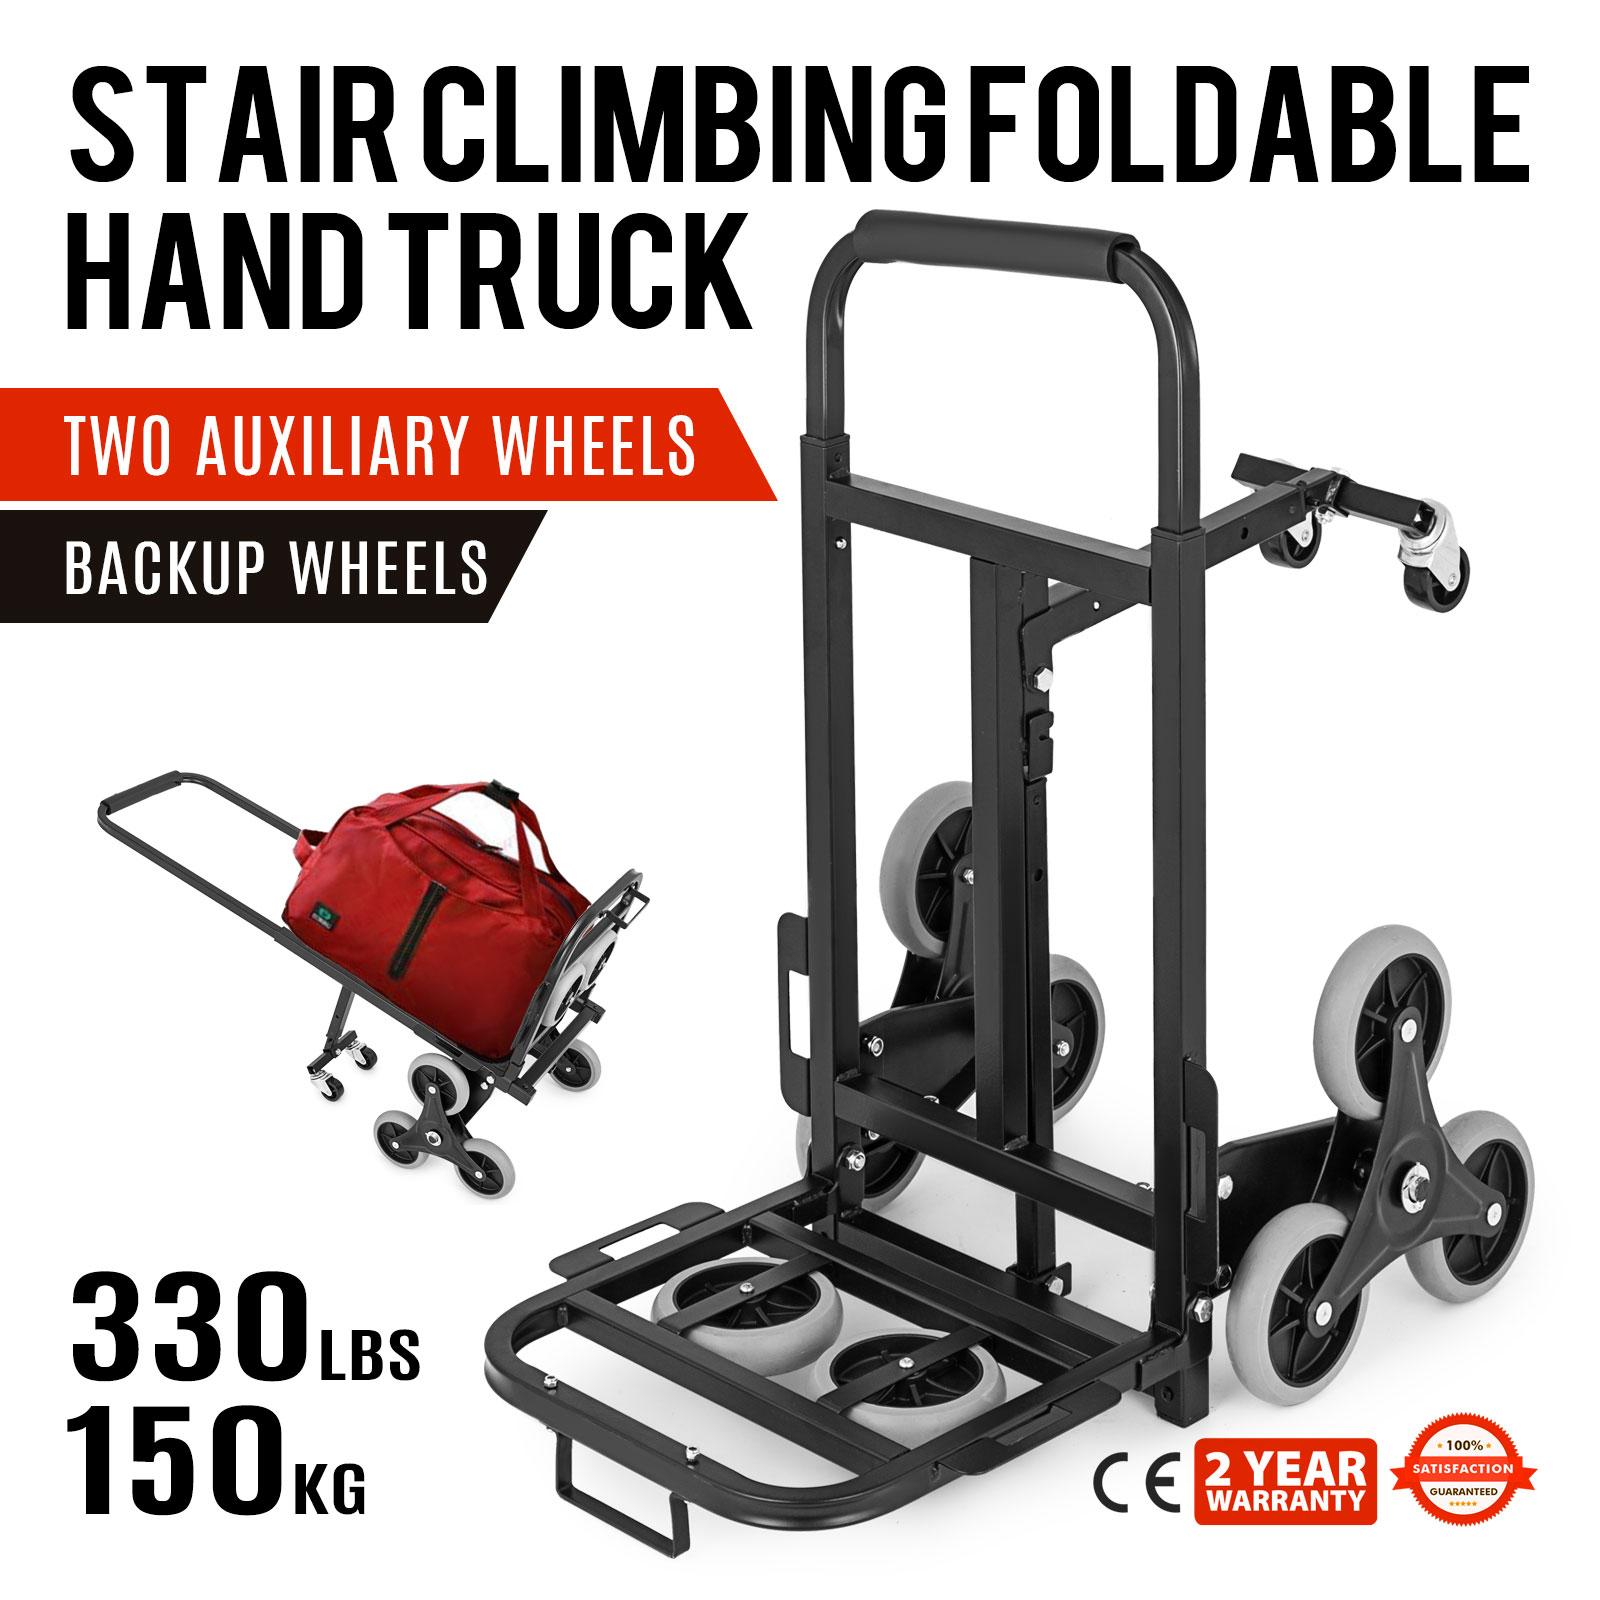 330lb Hd Folding Climbing Stair Cart Hand Truck Dolly